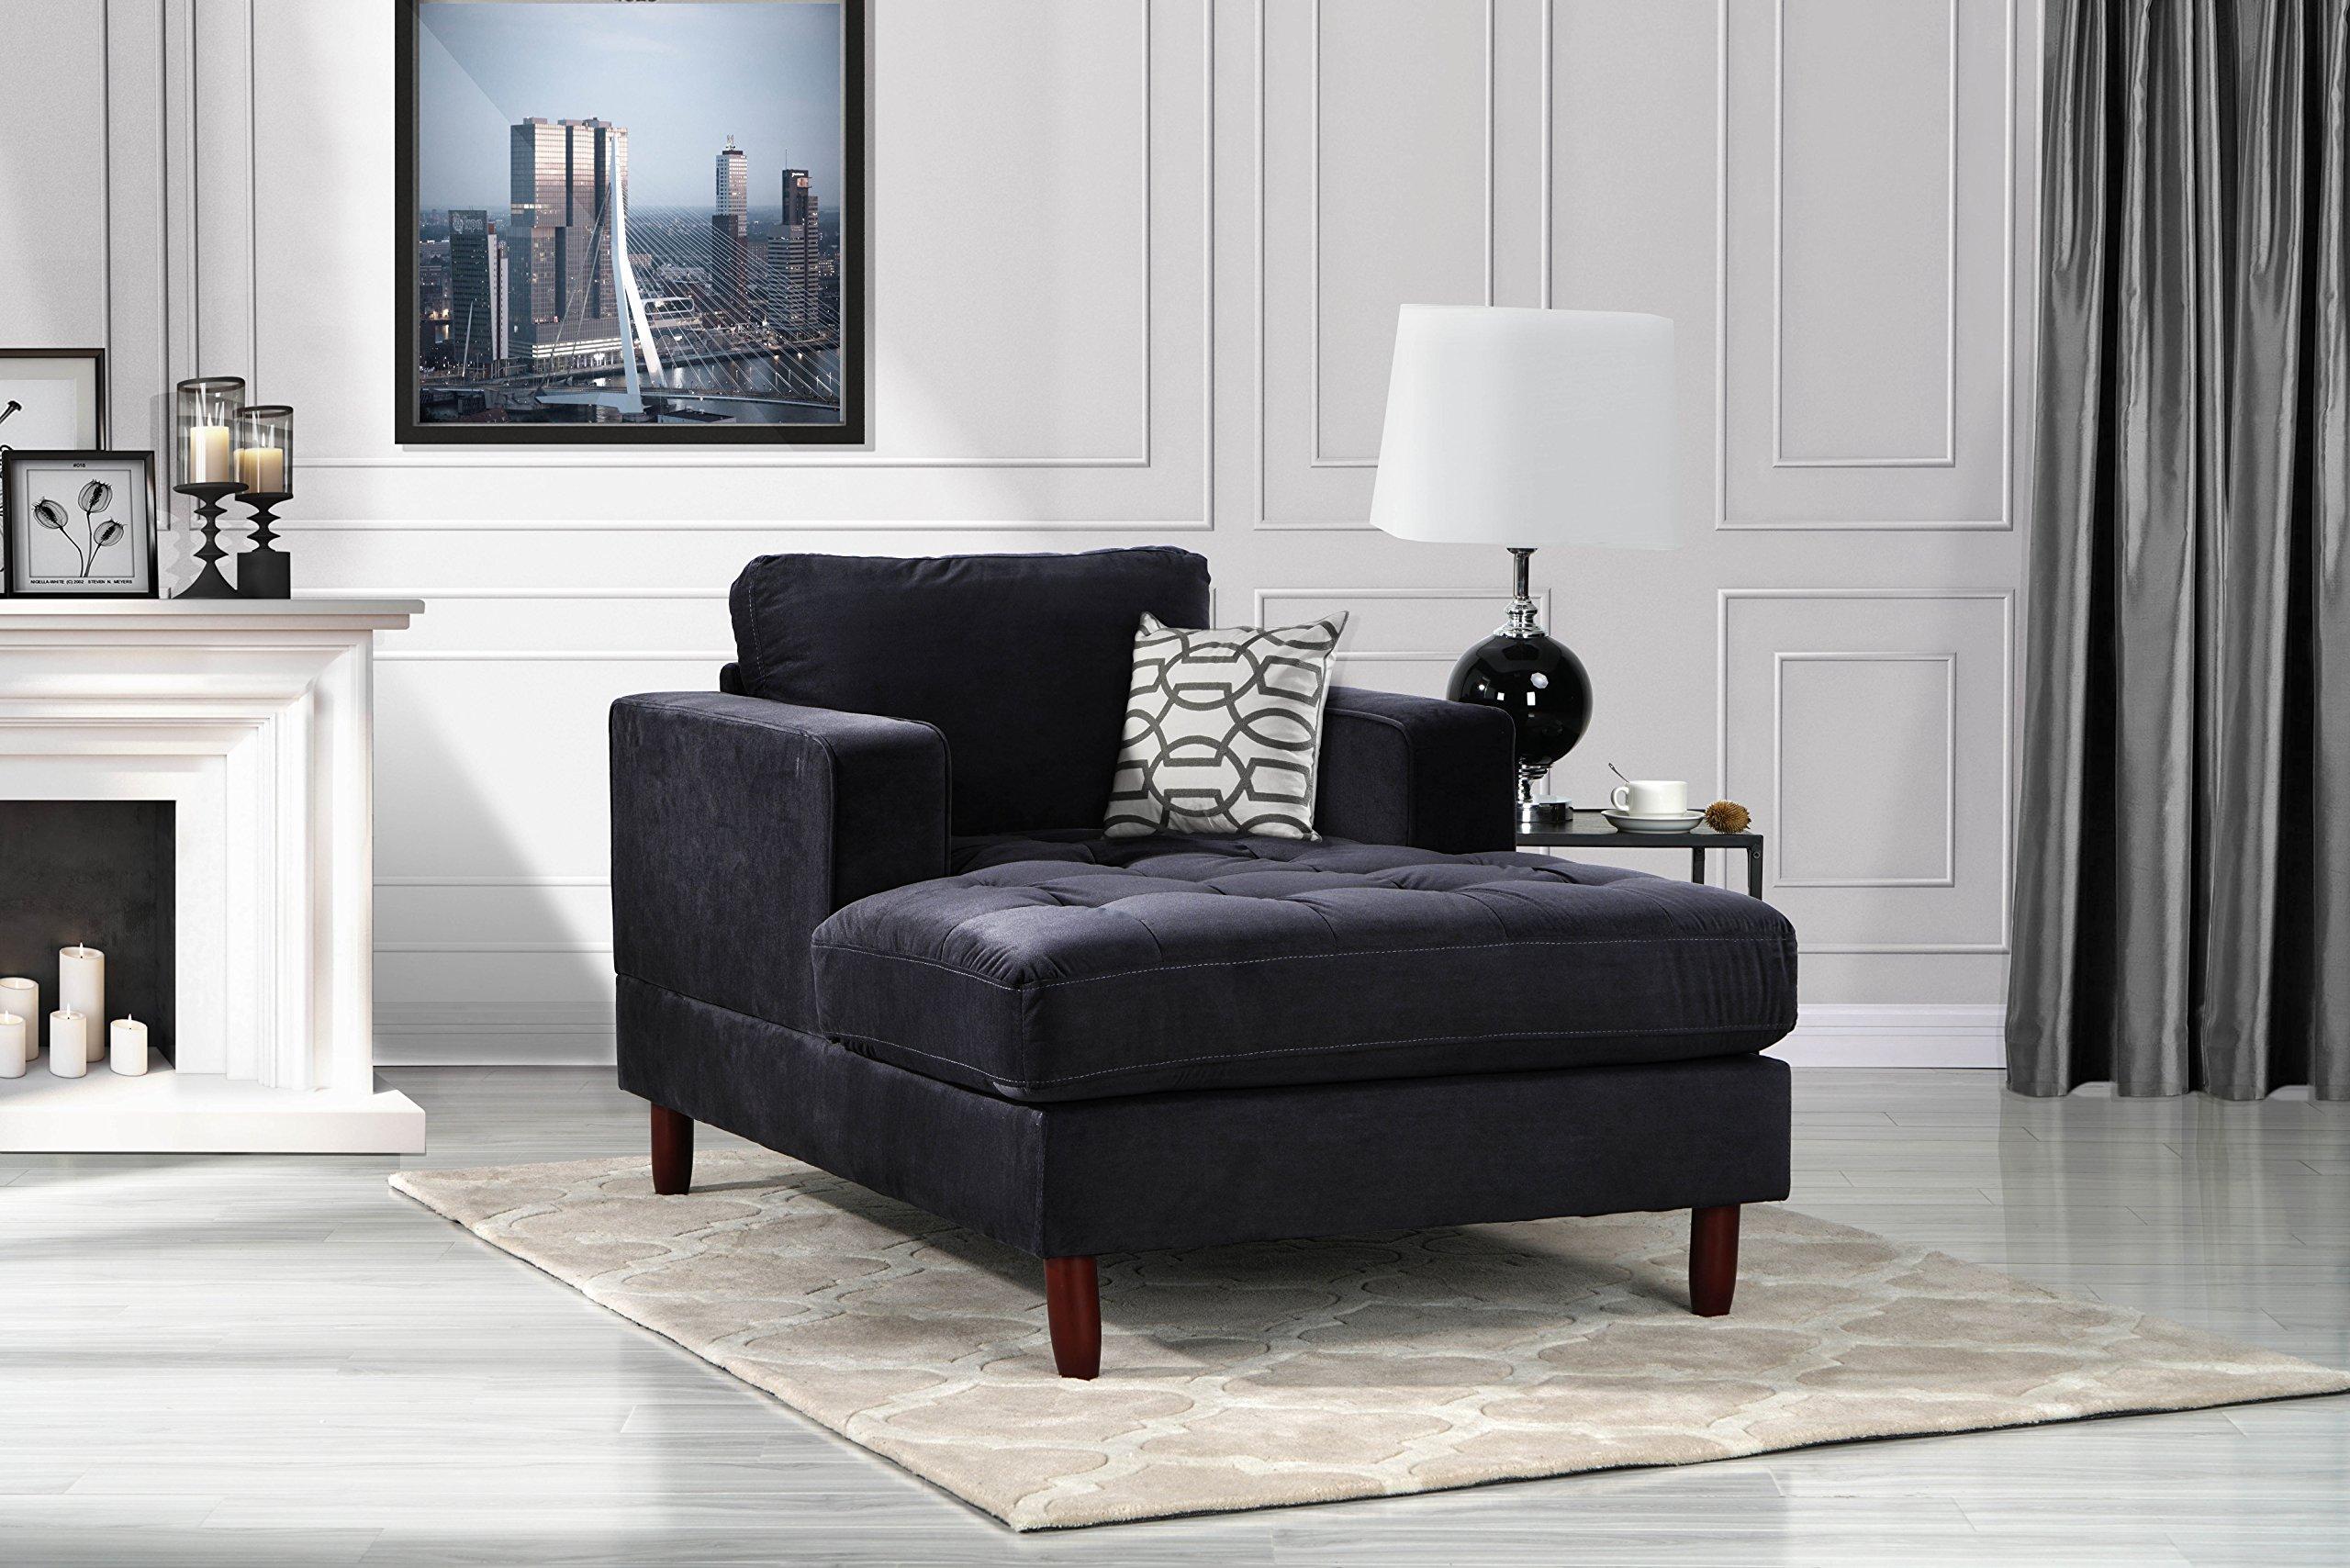 DIVANO ROMA FURNITURE Mid Century Modern Velvet Fabric Living Room Chaise Lounge (Black) by Divano Roma Furniture